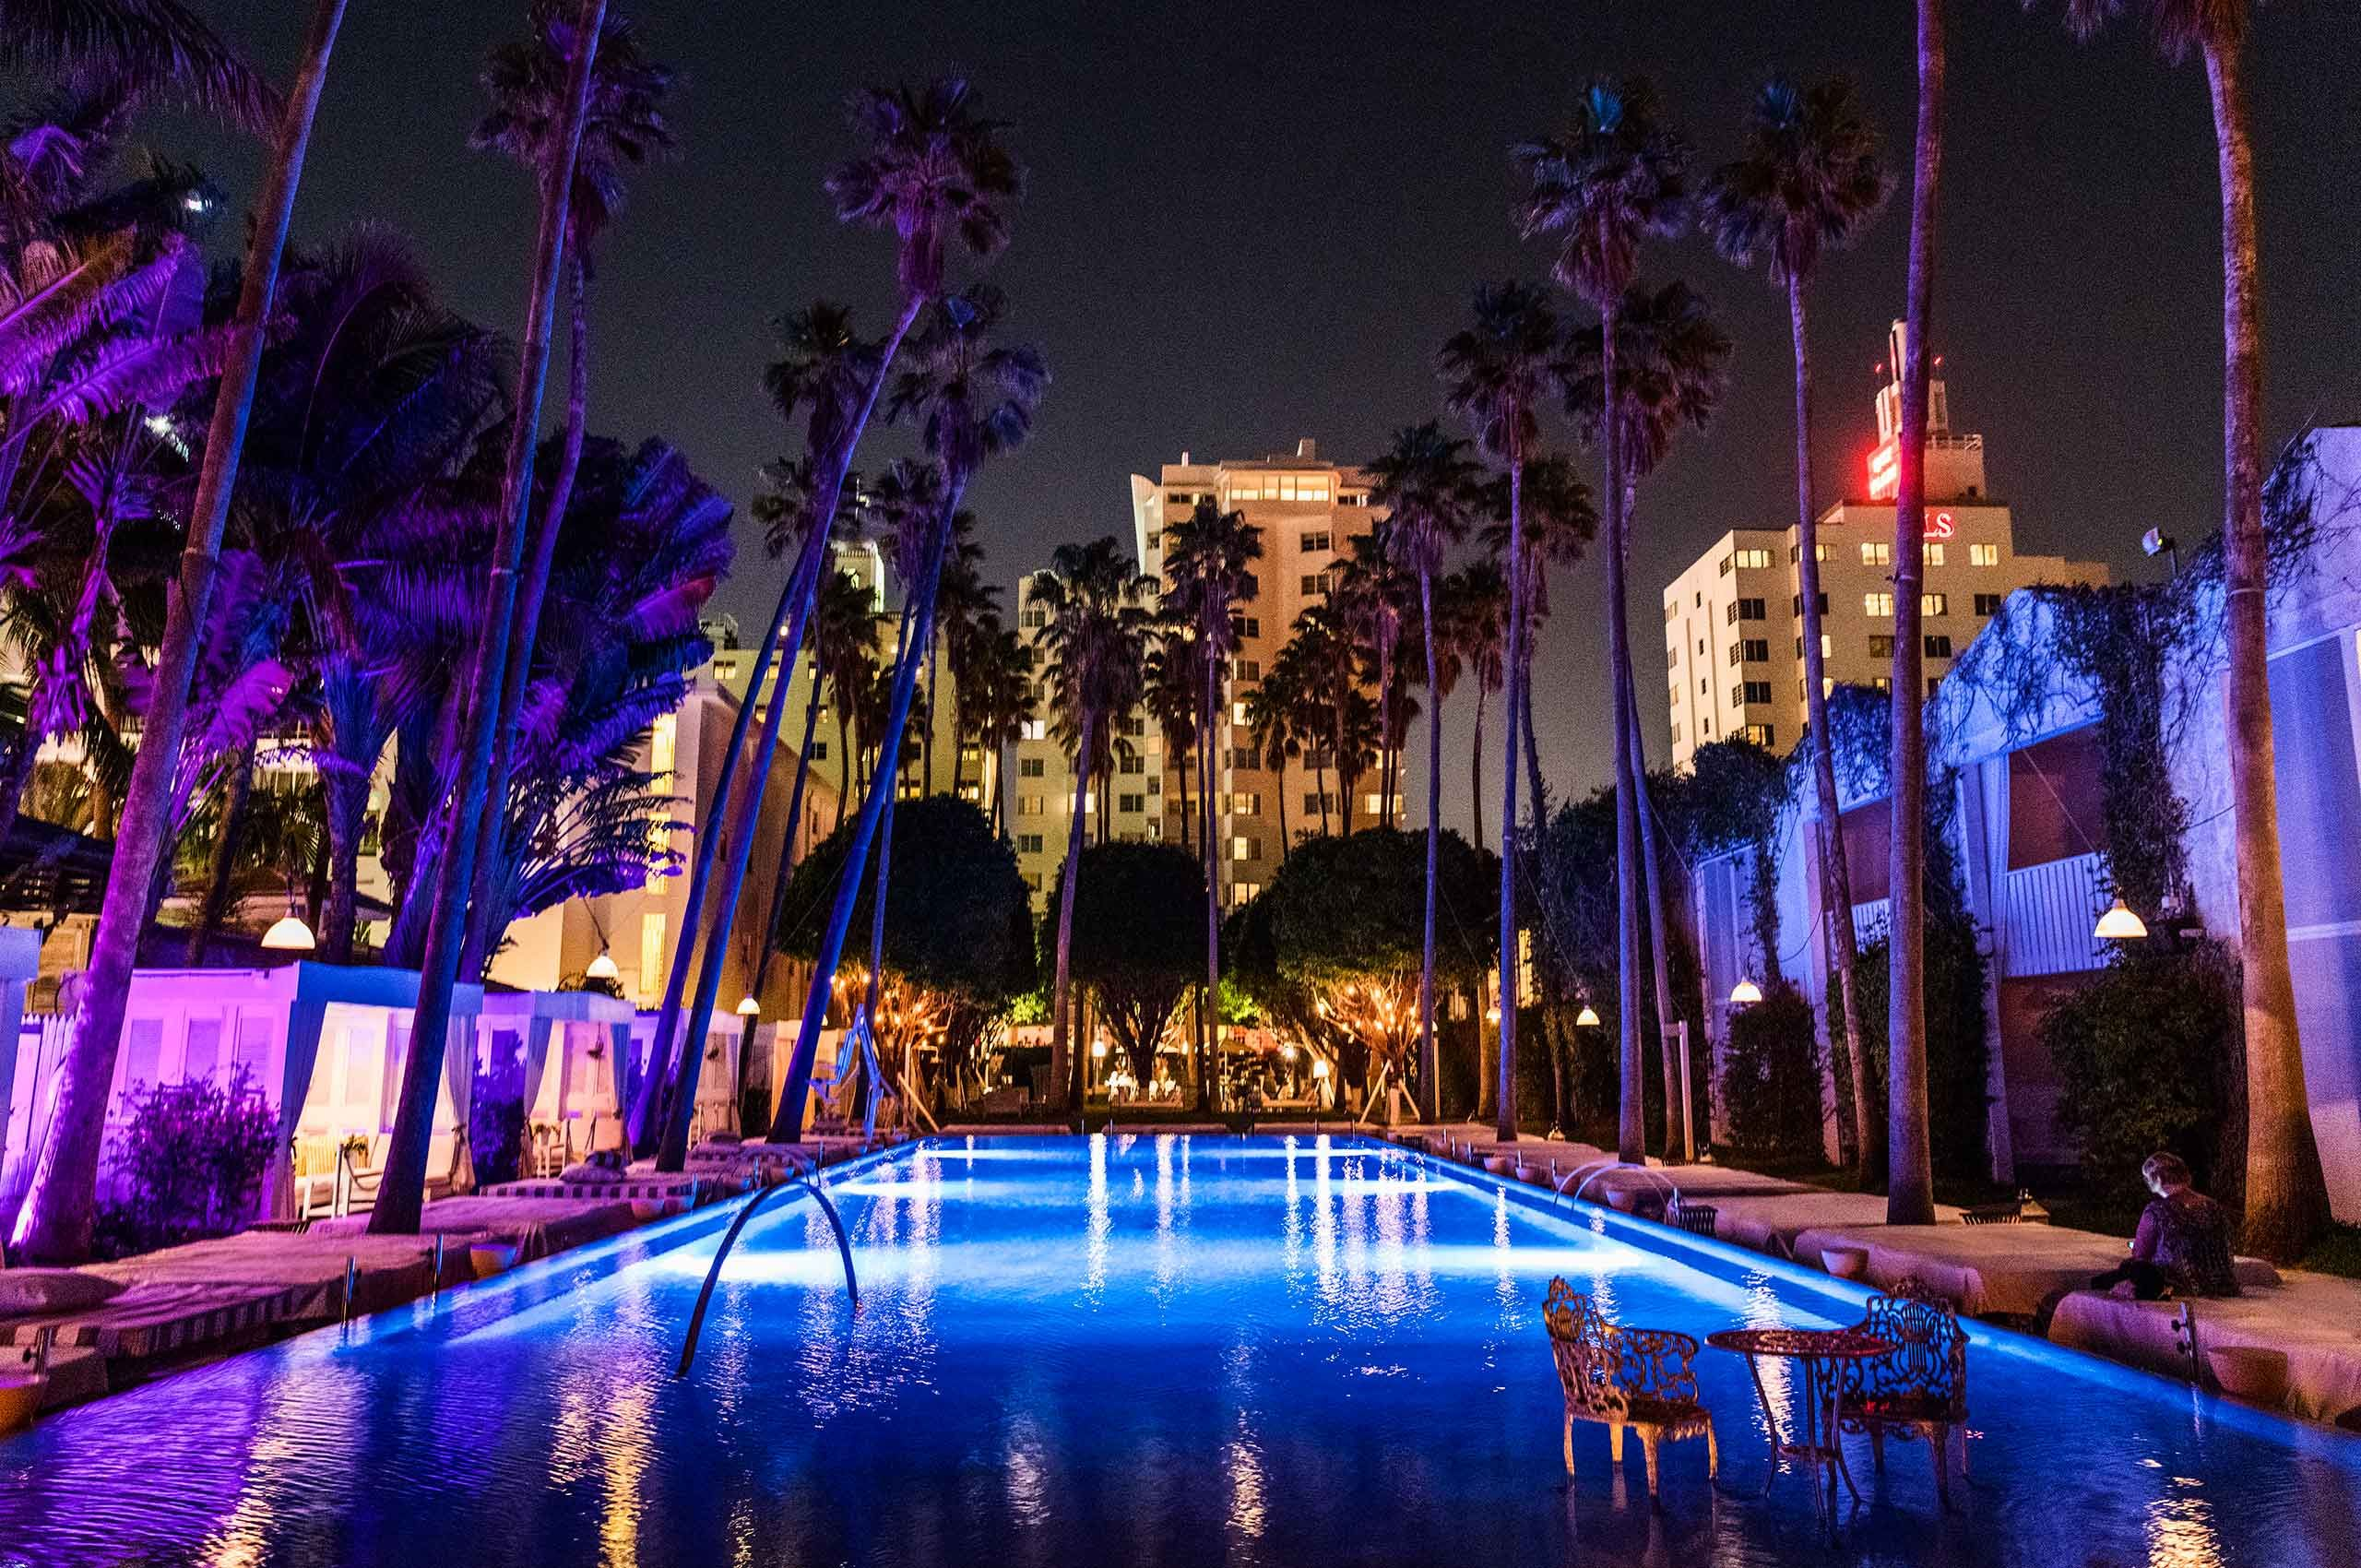 Delano-pool-in-Miami-by-HenrikOlundPhotography.jpg